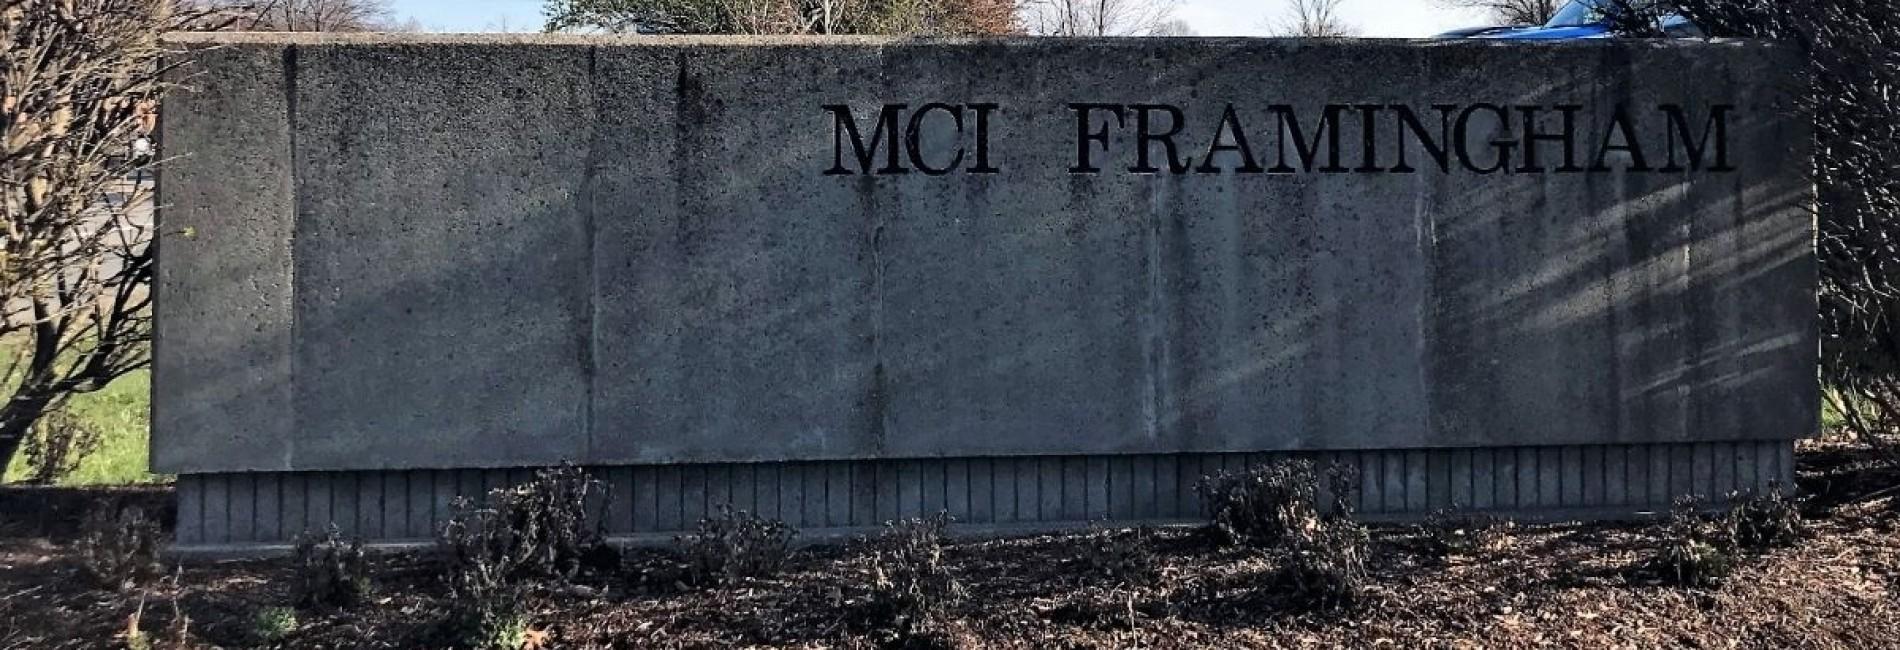 MCI Framingham